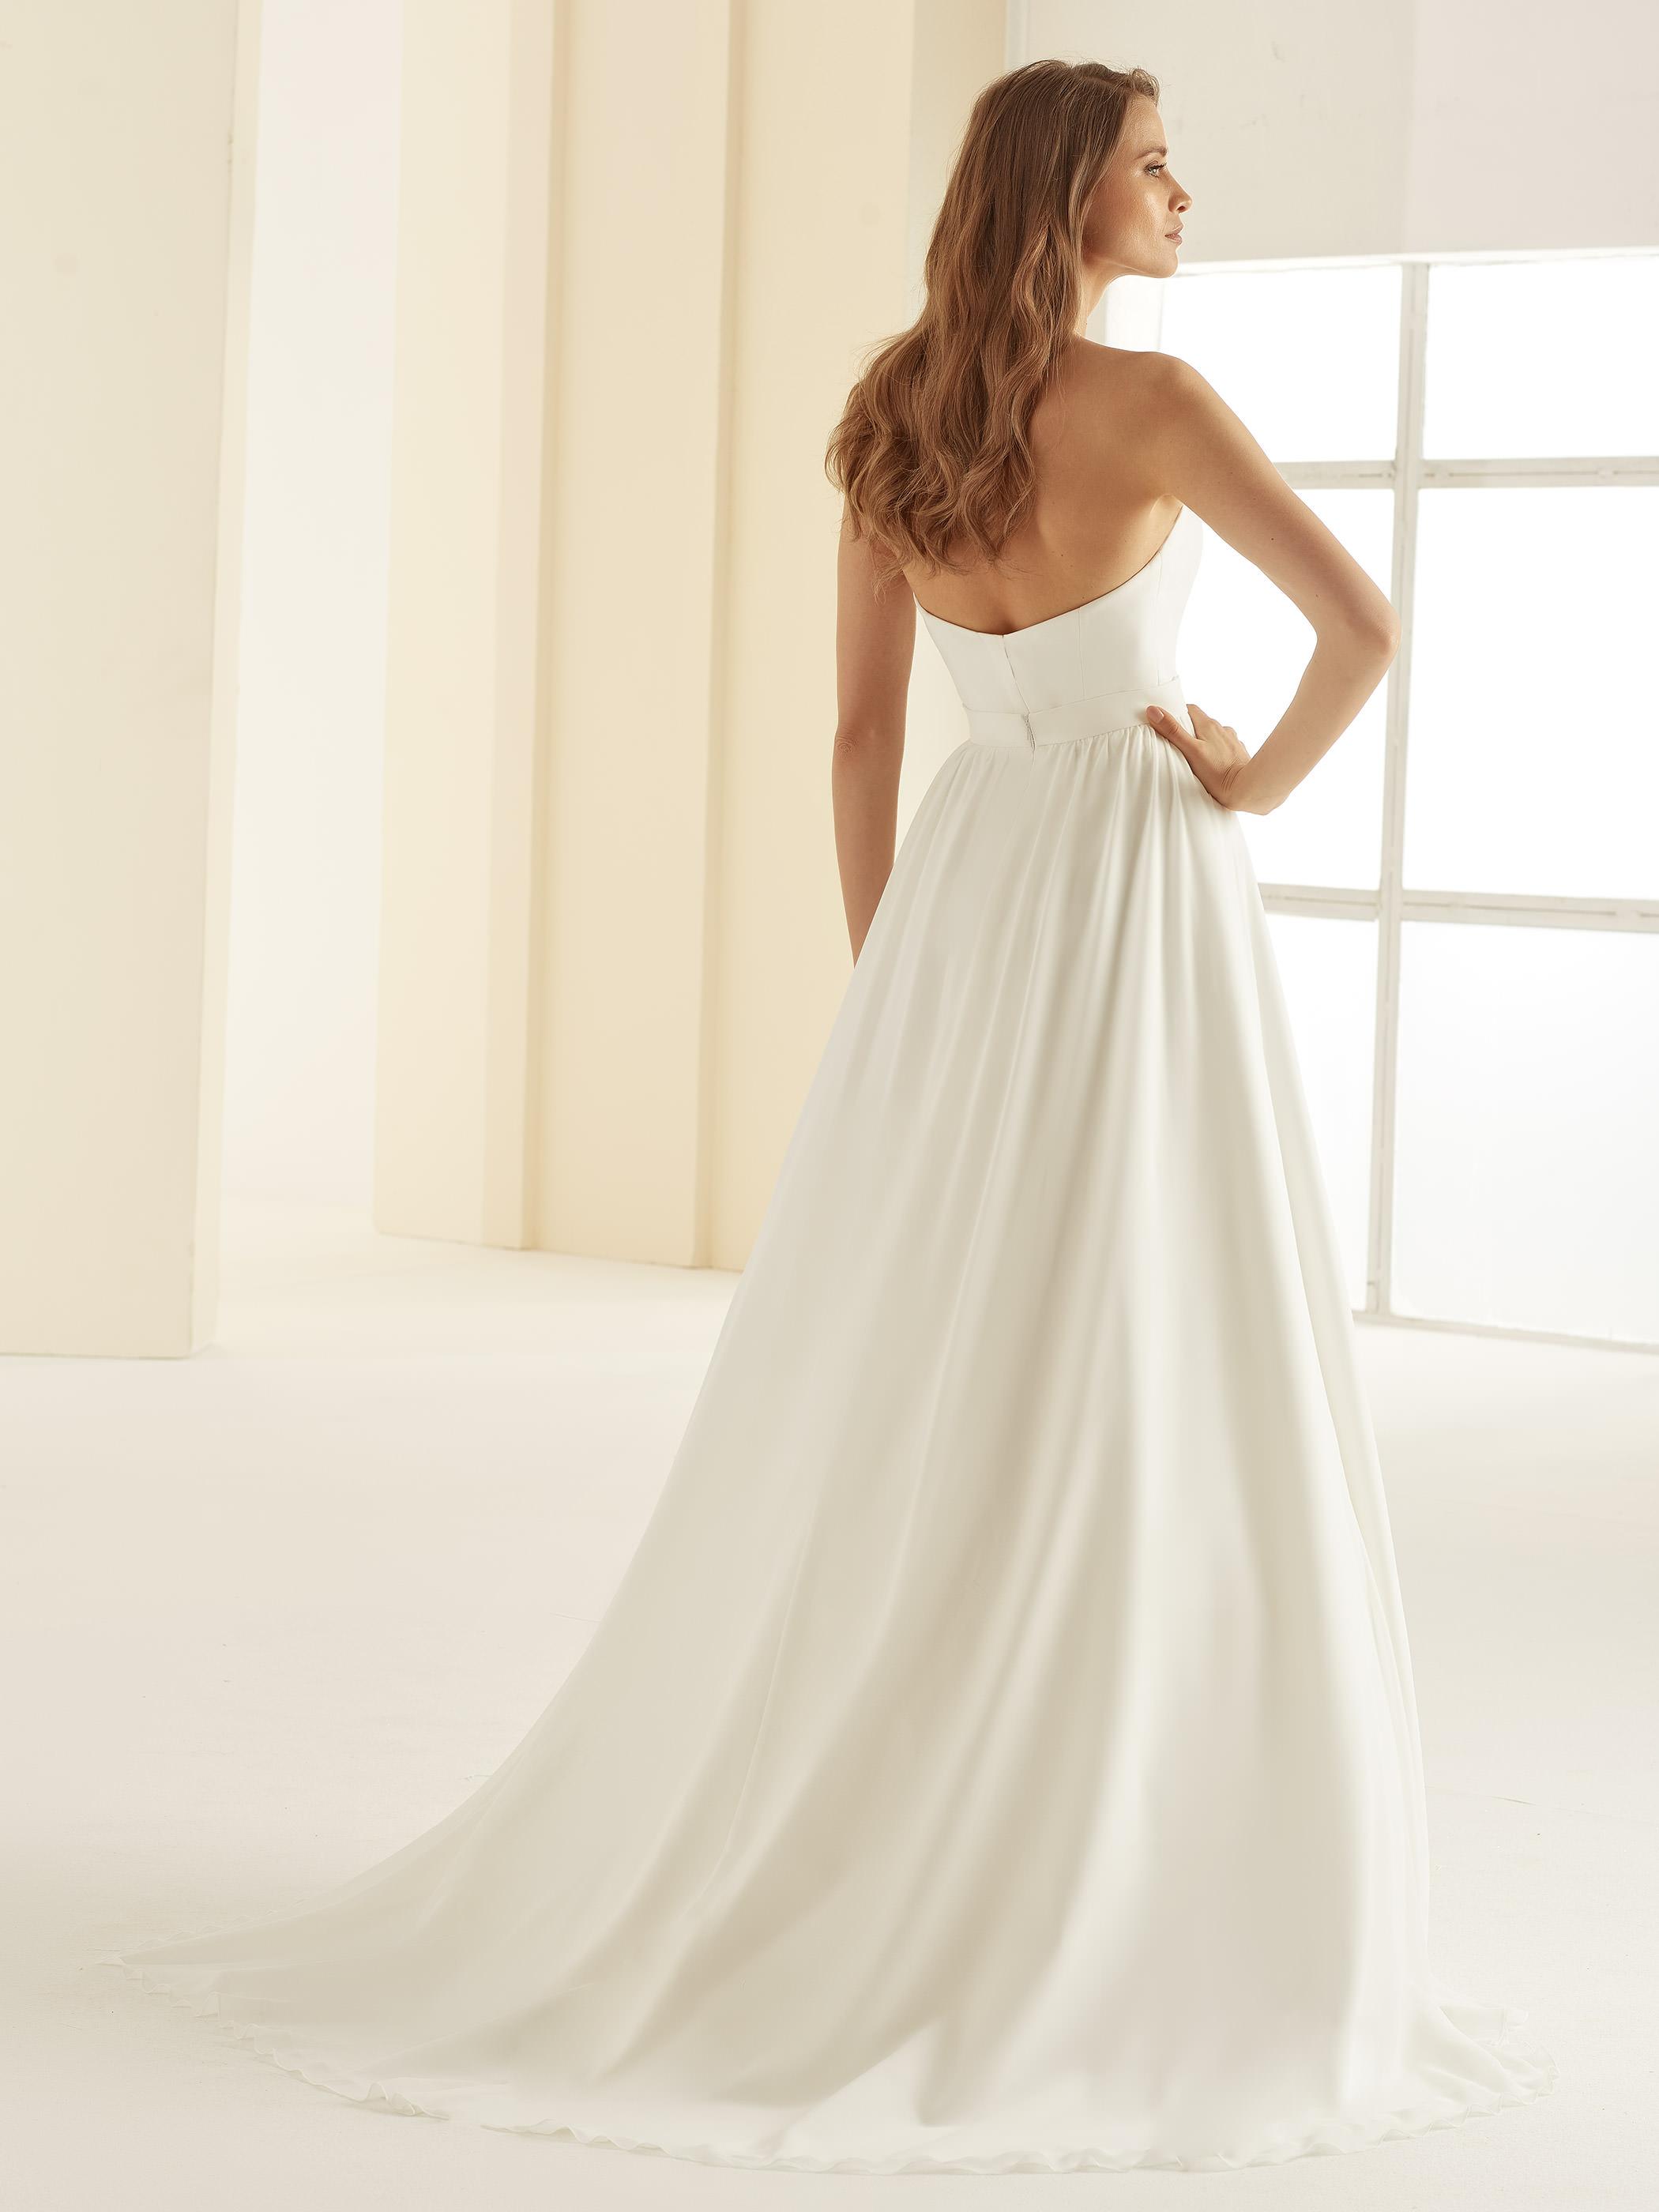 SARDINIA-Bianco-Evento-bridal-separates_skirt-(3)